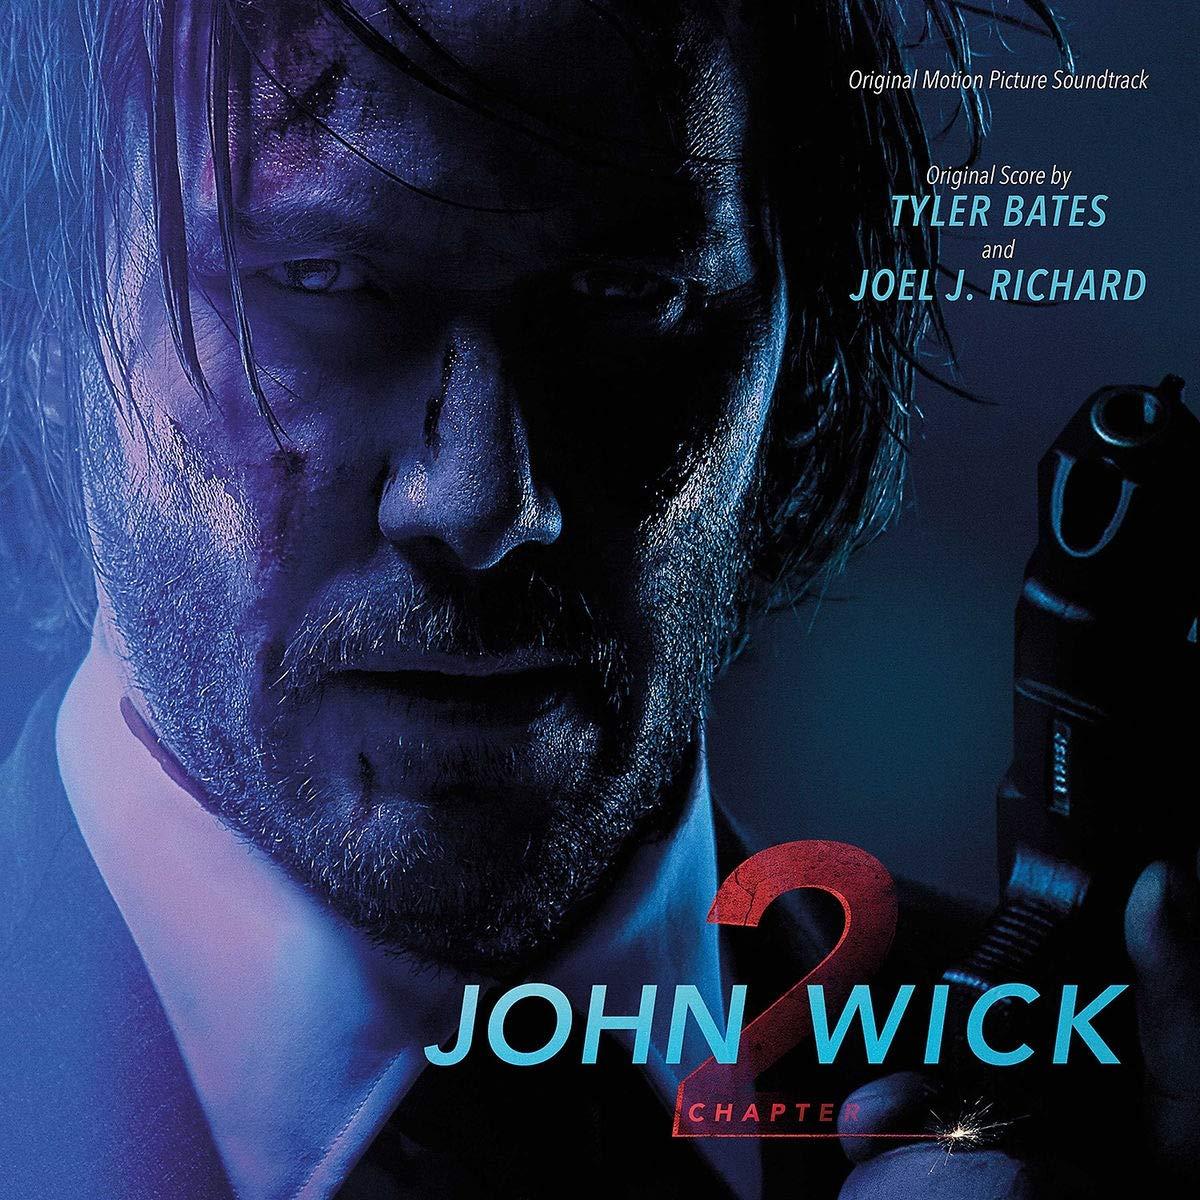 Tyler Bates Joel J Richard John Wick Chapter 2 2017 Film Onvinylstore